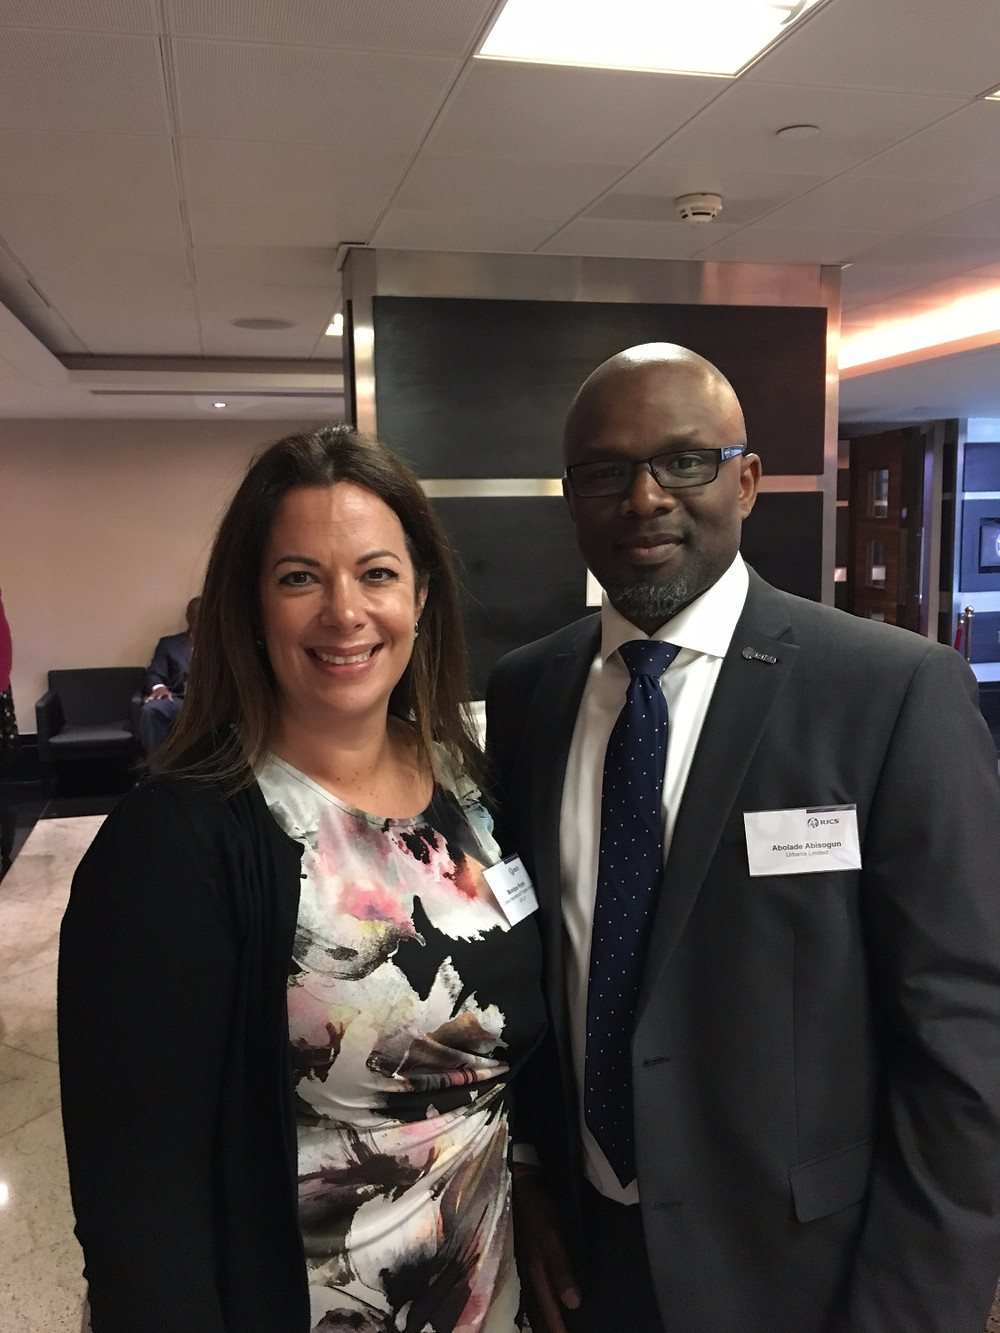 Monique Royle, RICS West Midlands Regional Board with Bola Abisogun FRICS of RICS London Regional Board